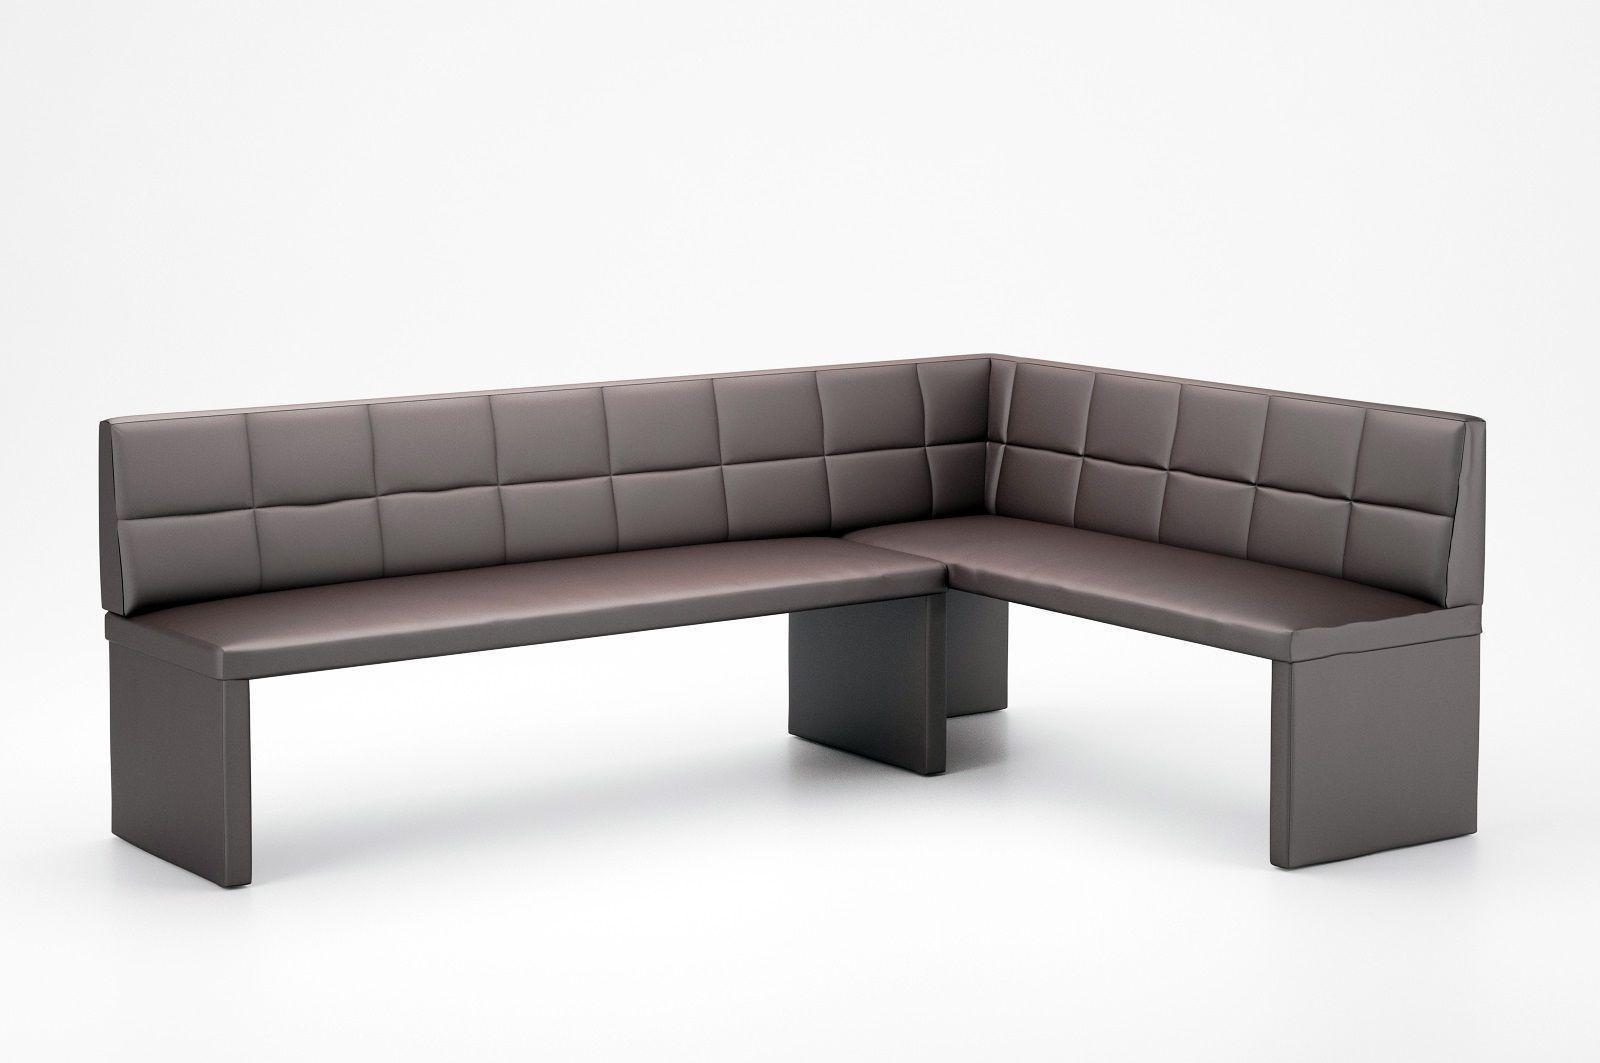 kchenbank sofa interesting big sofa lutz elegant riesen. Black Bedroom Furniture Sets. Home Design Ideas